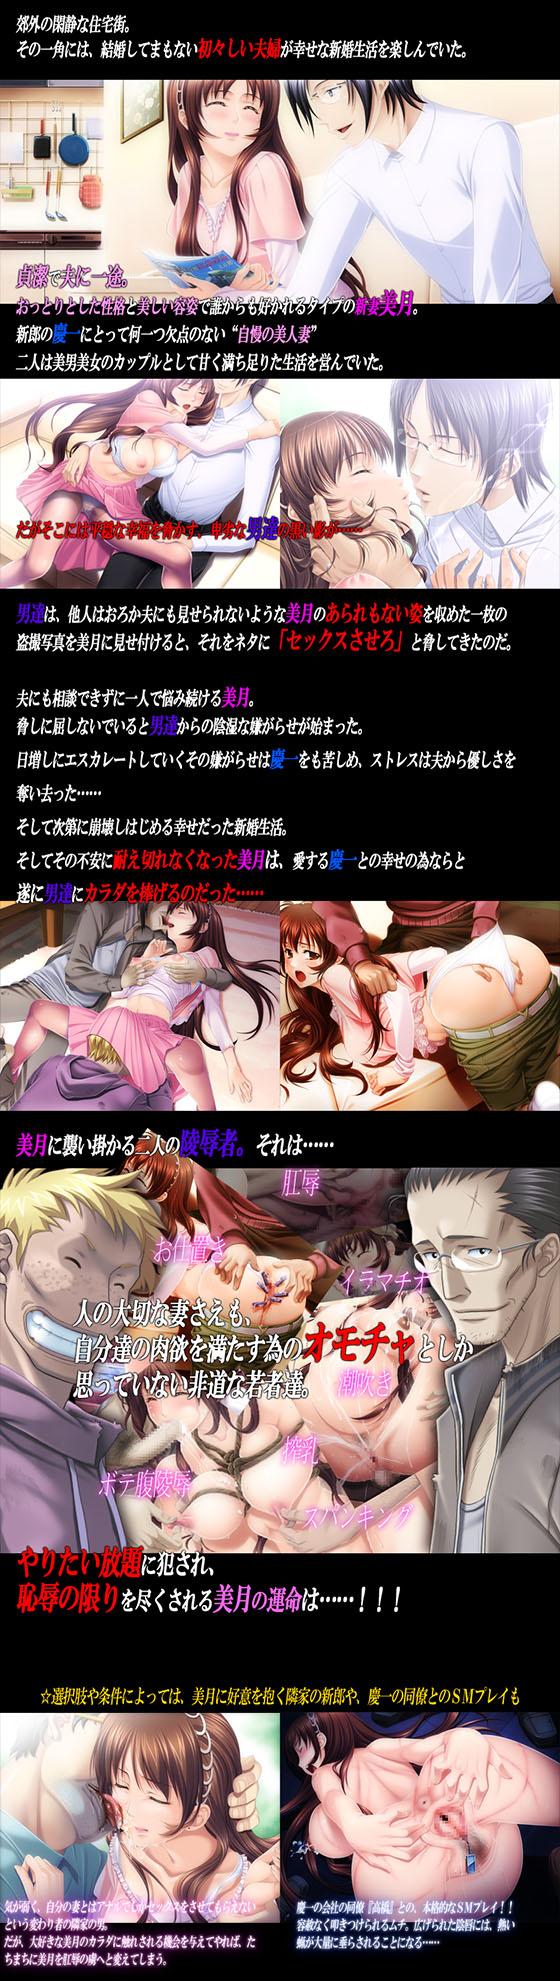 01_Story.jpg